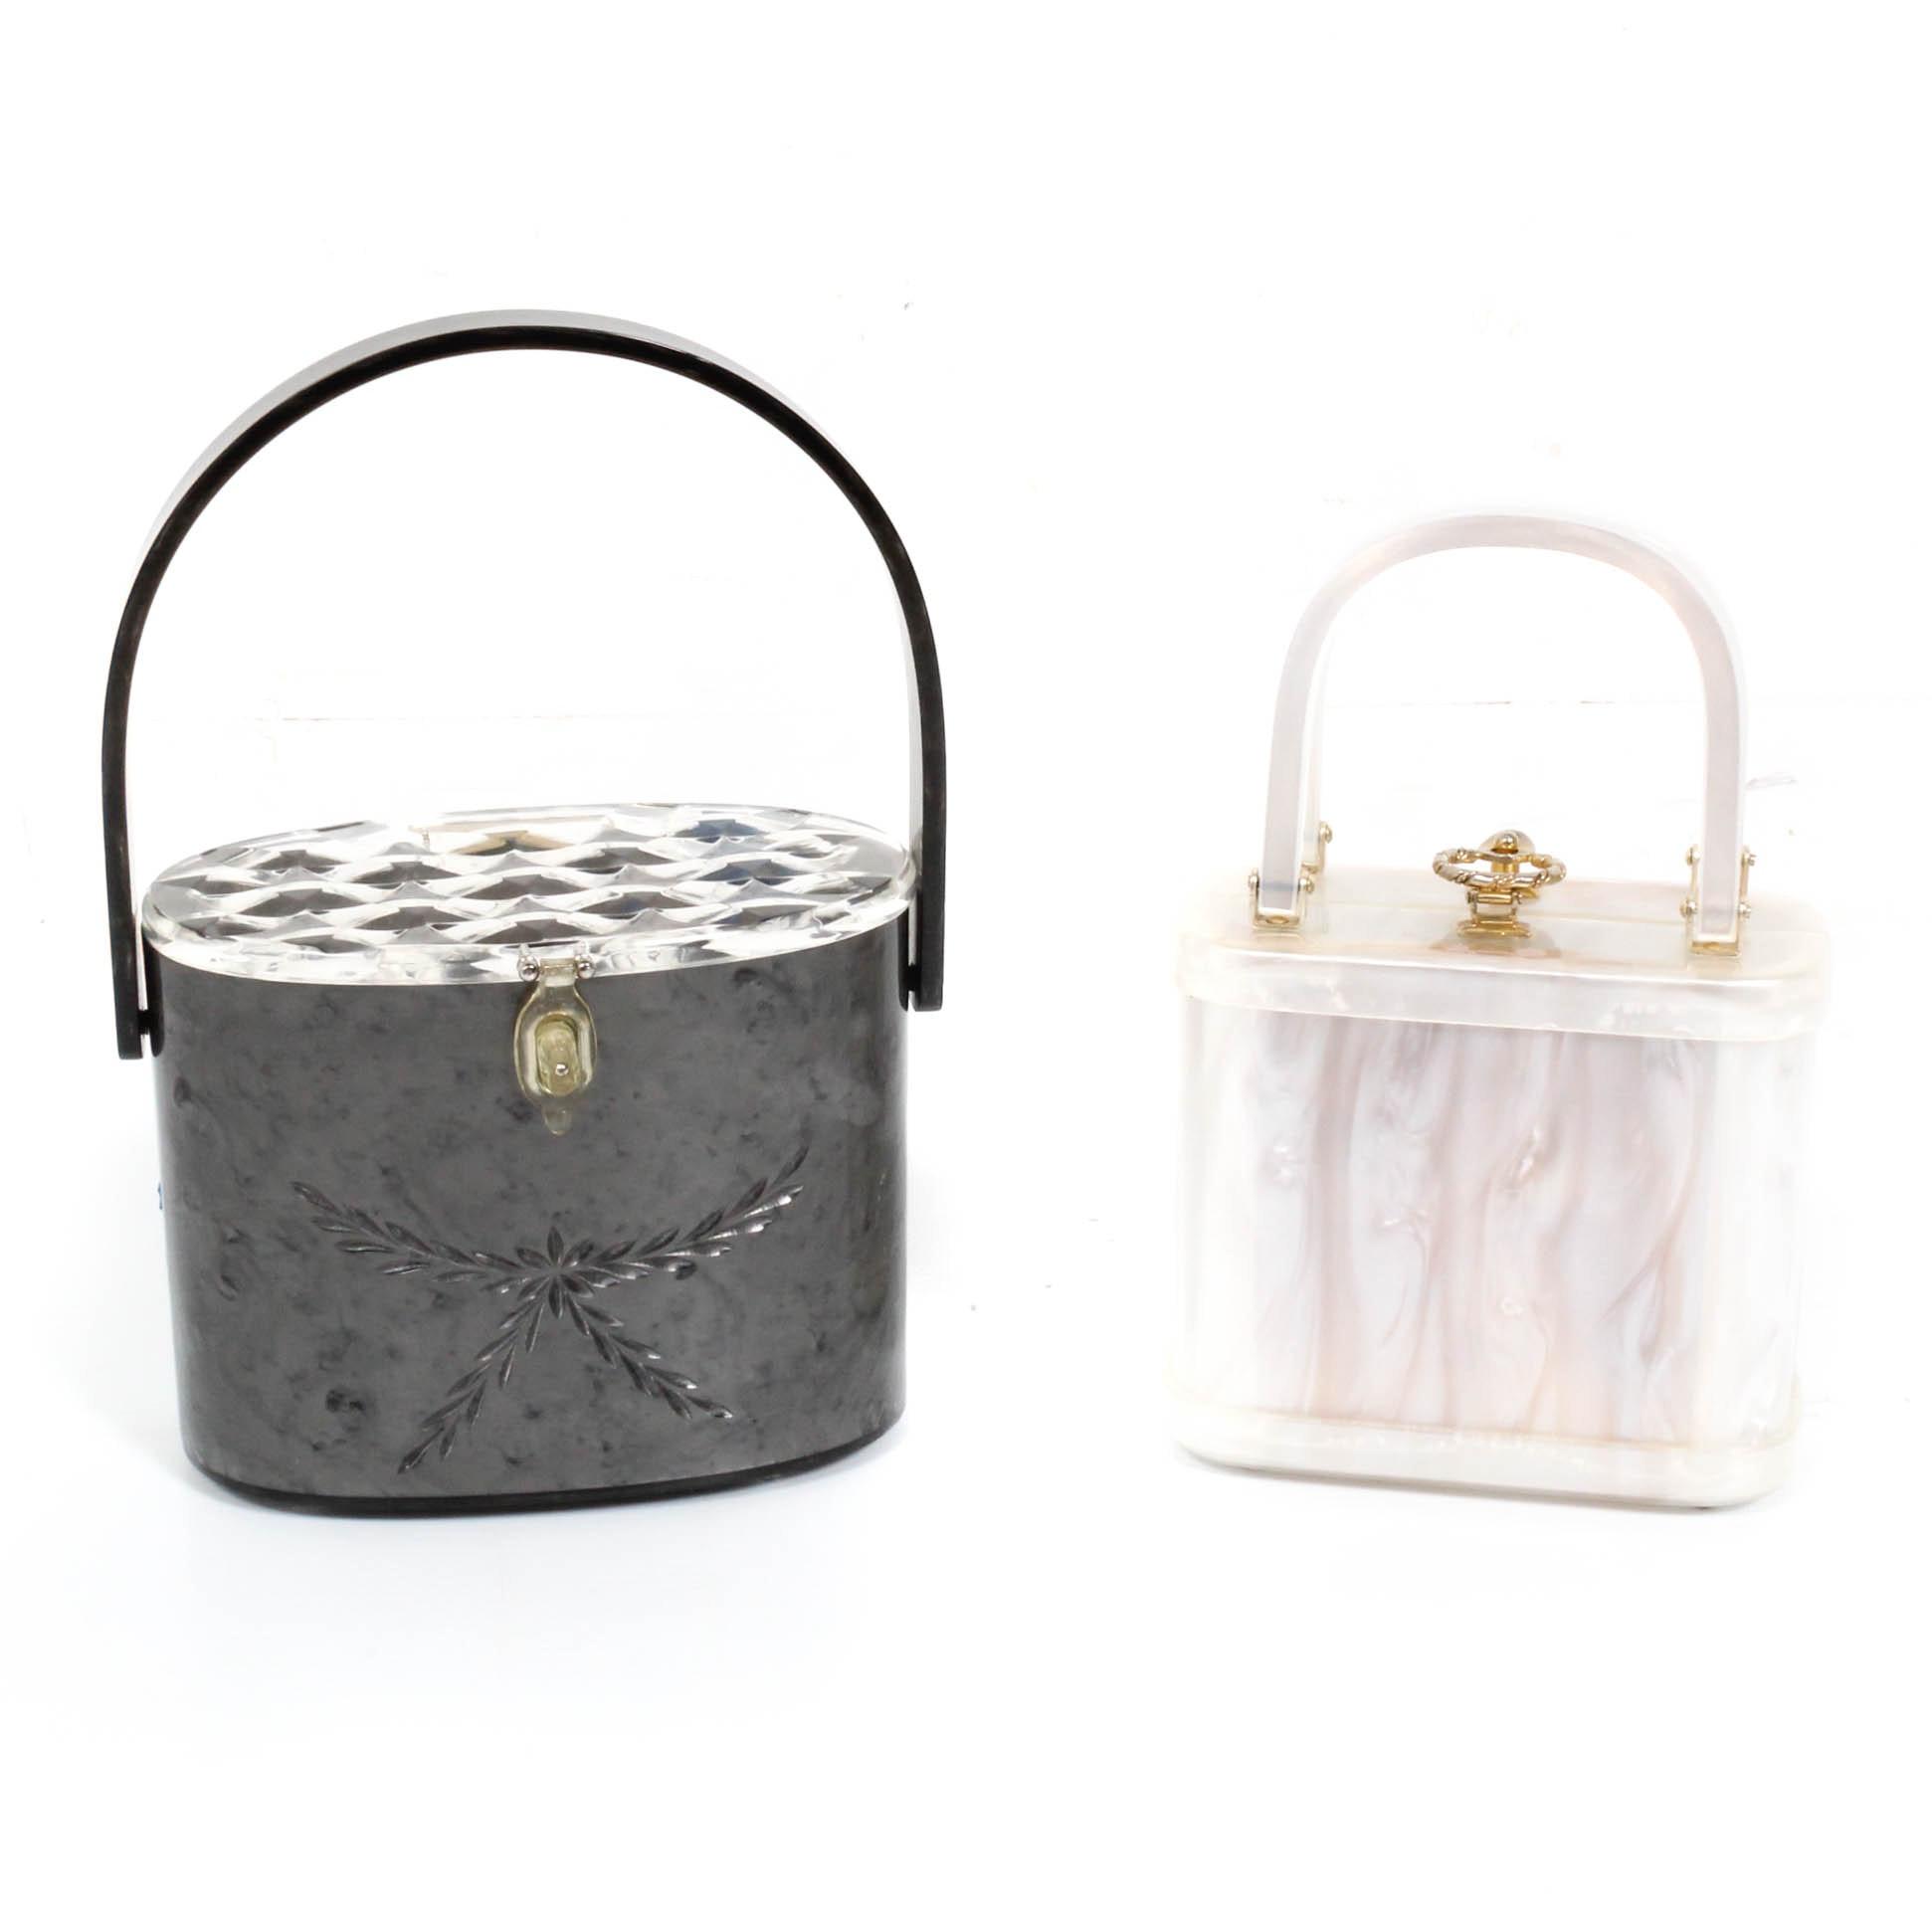 Vintage Original Rialto New York and Stylecraft Miami Lucite Handbags